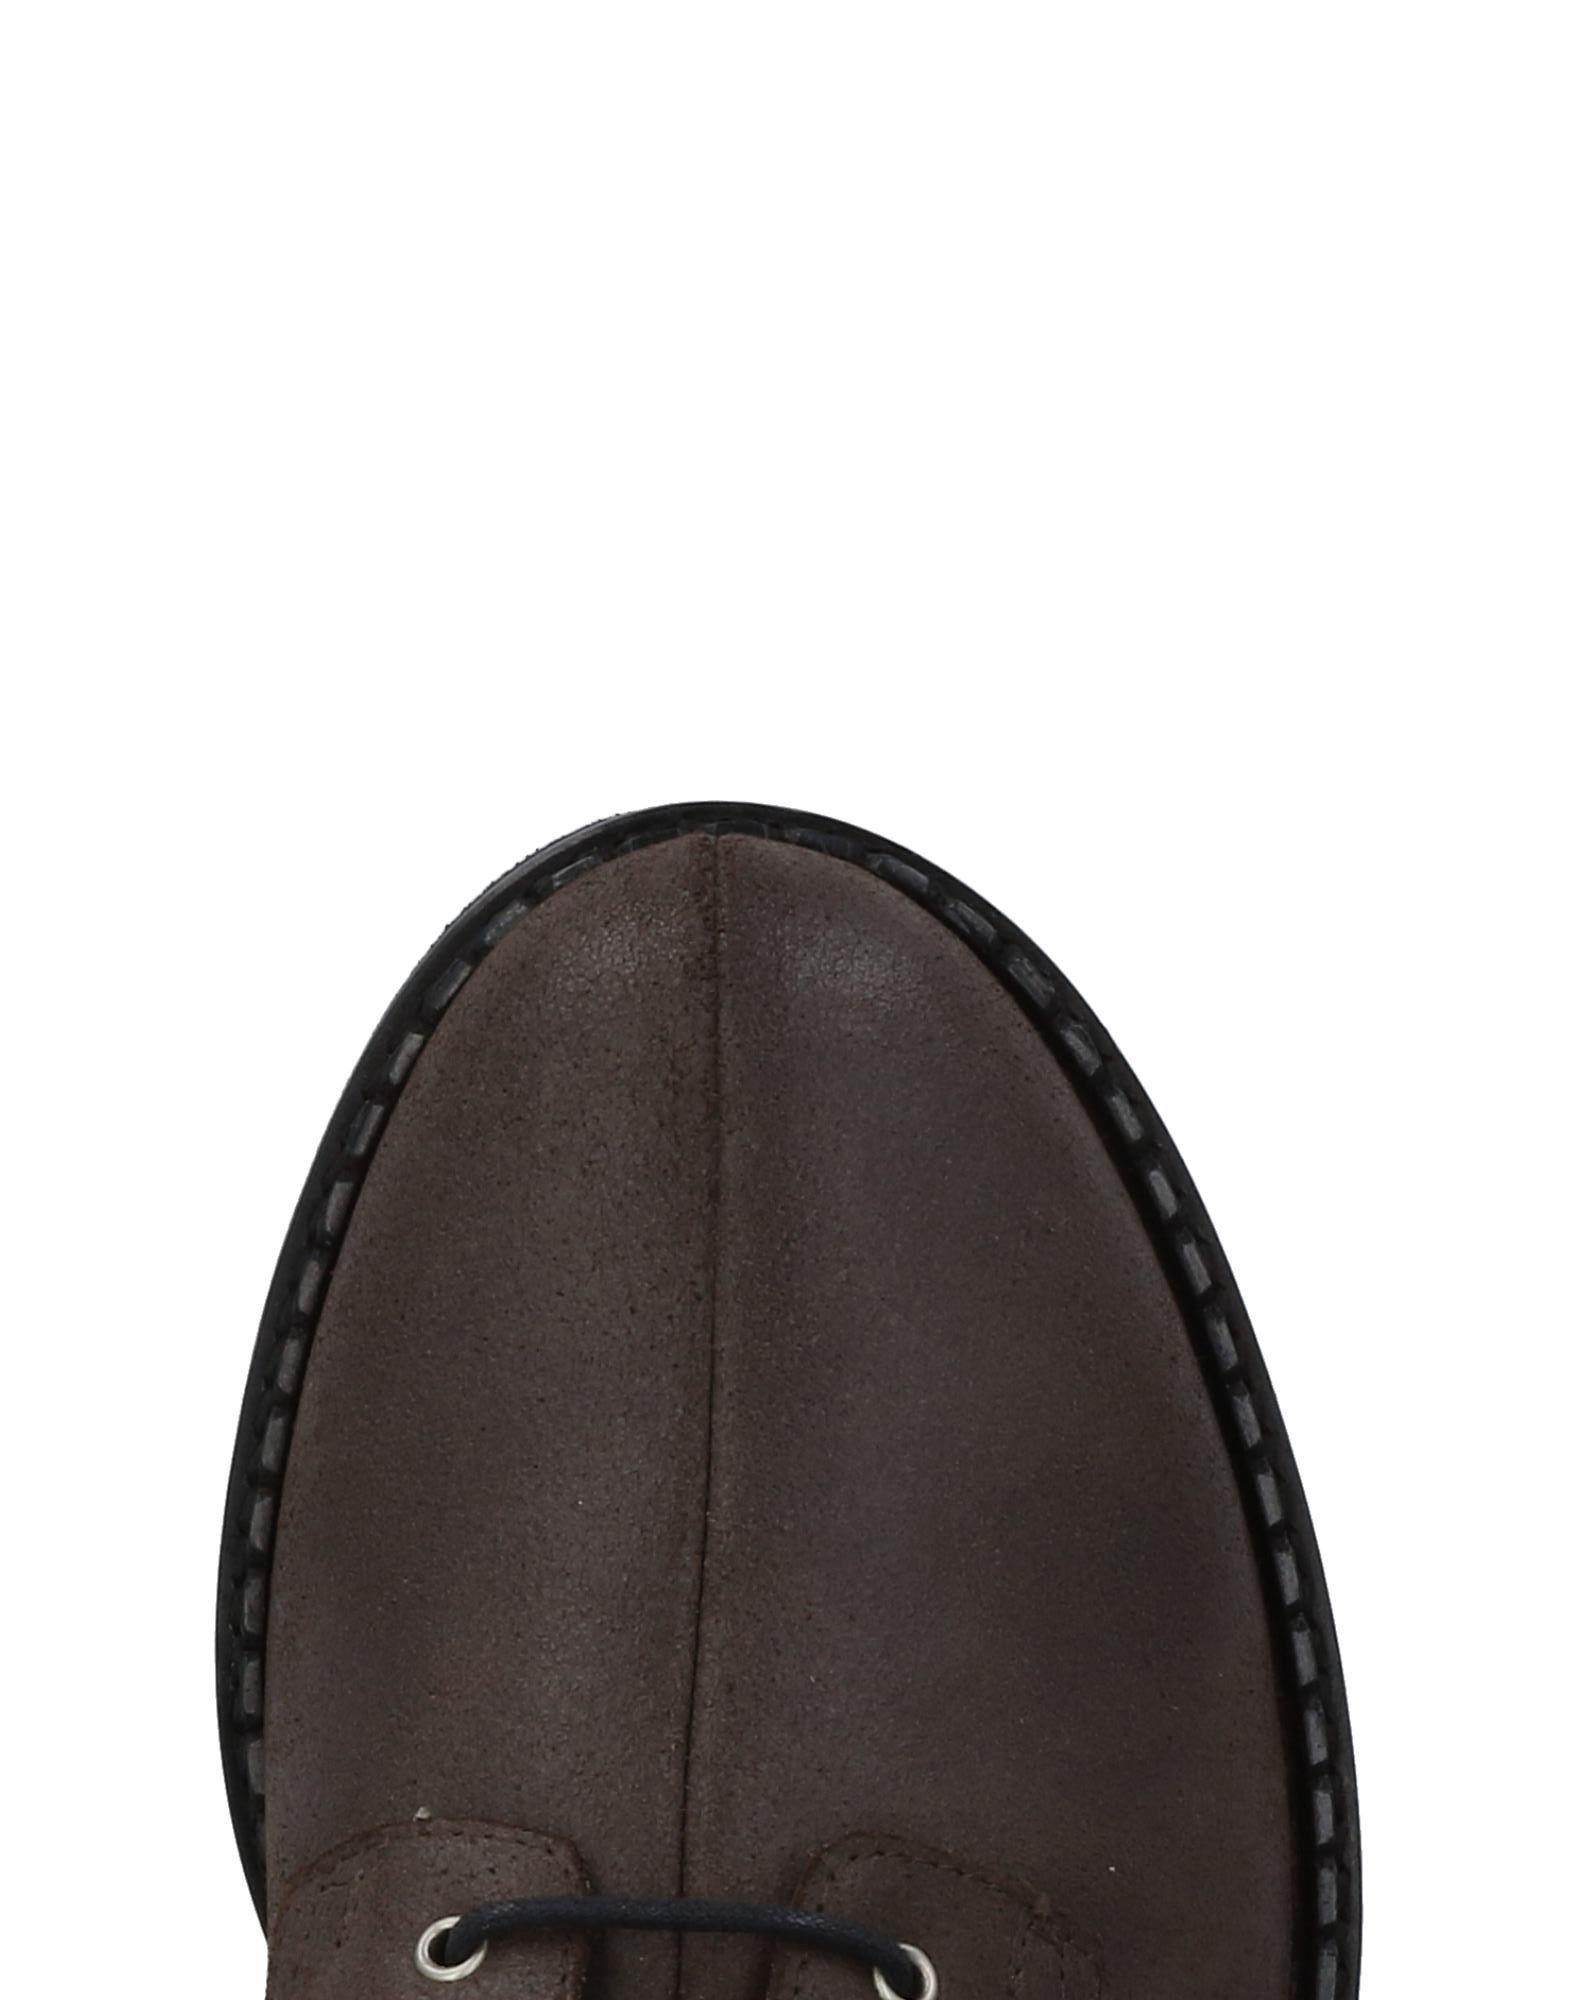 L'f Shoes Schnürschuhe Herren  11481527XH